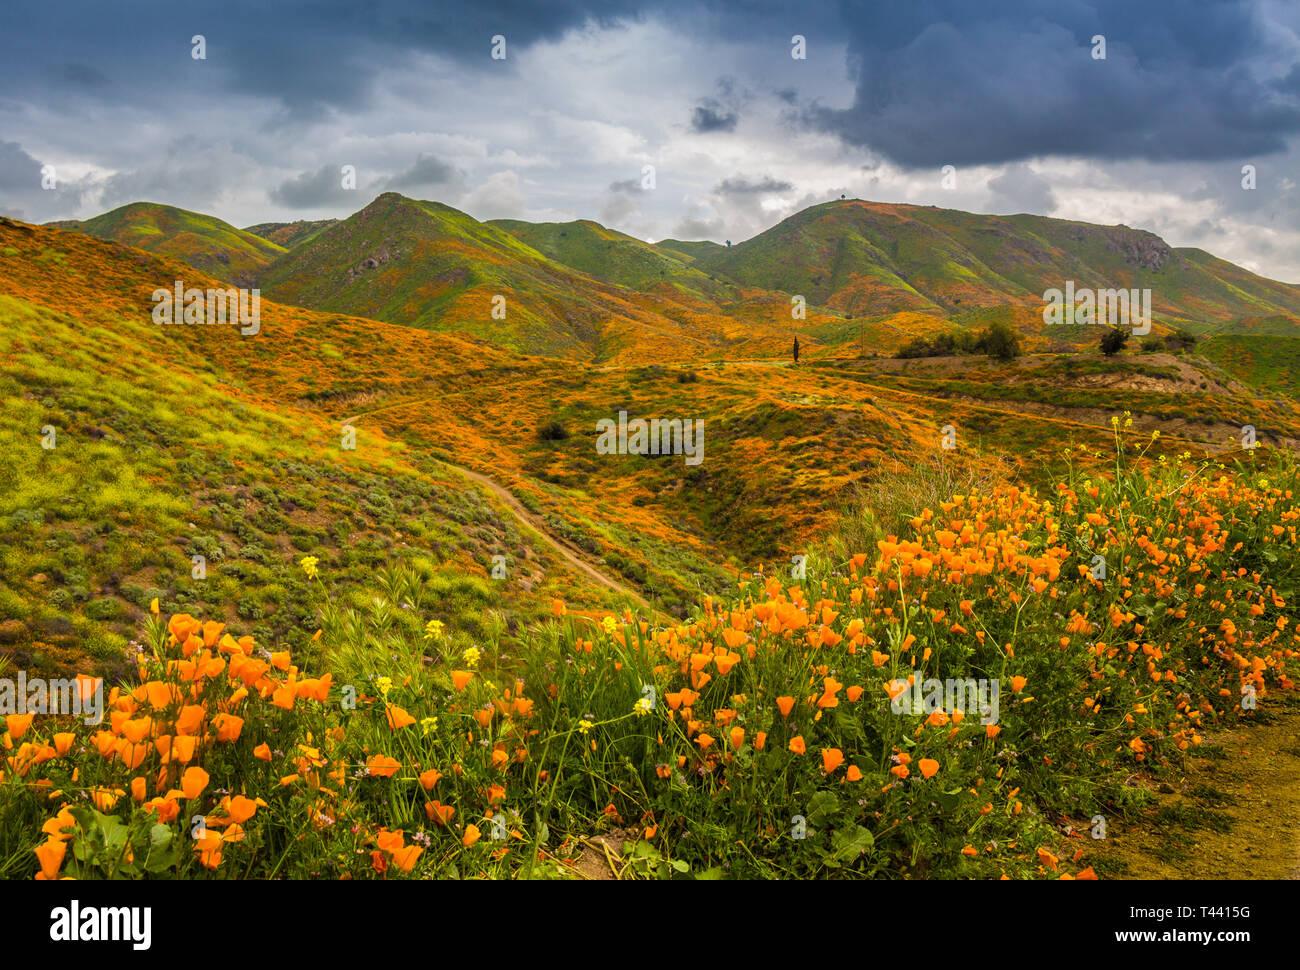 Poppy fields in Southern California. - Stock Image